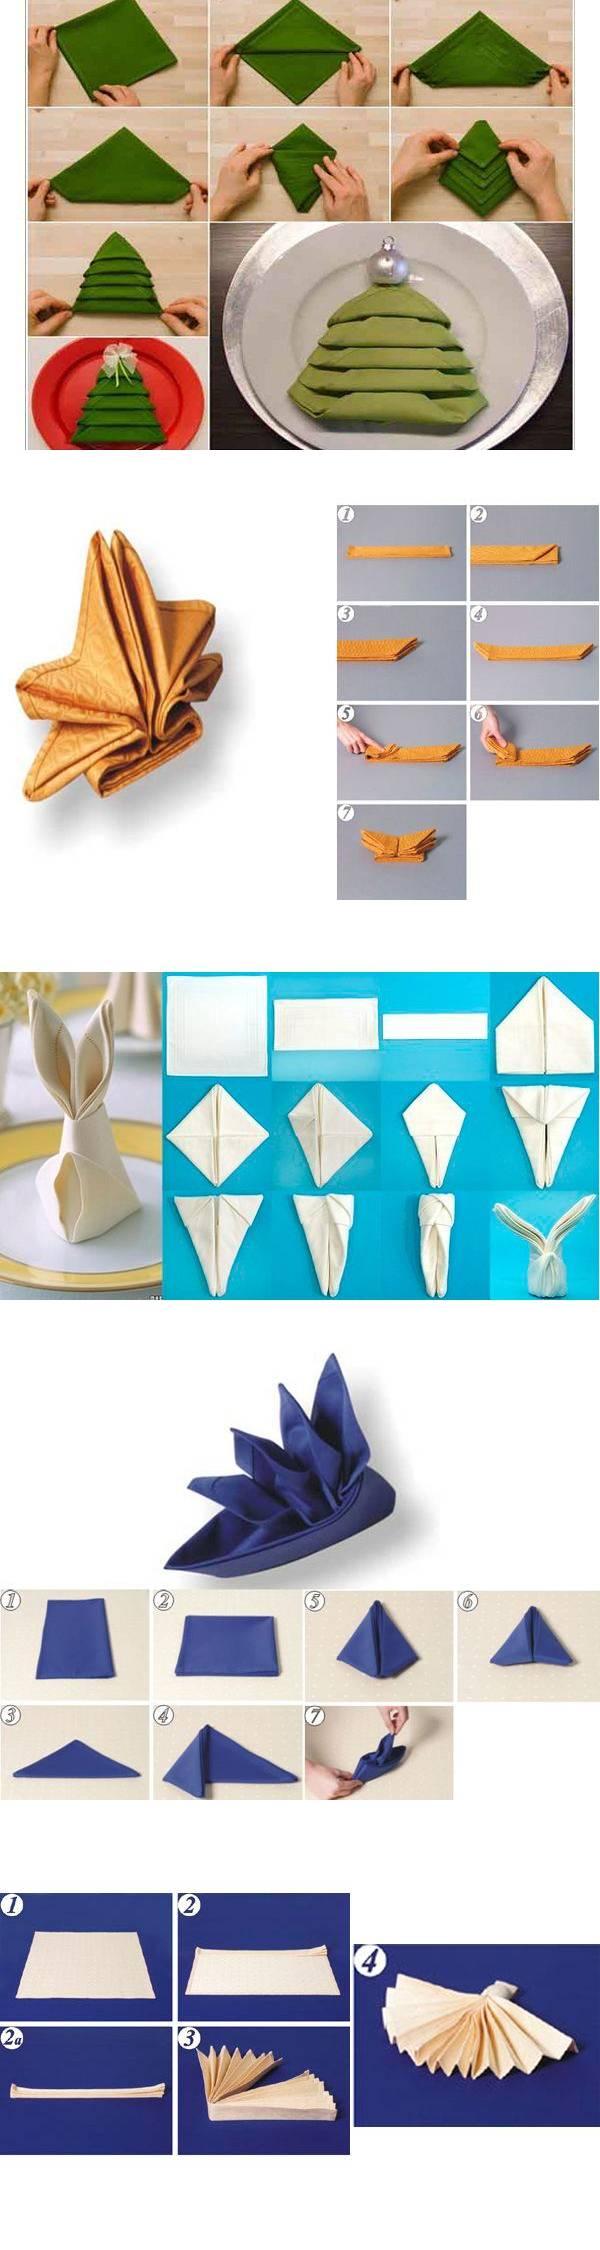 17 вариантов оформления салфеток